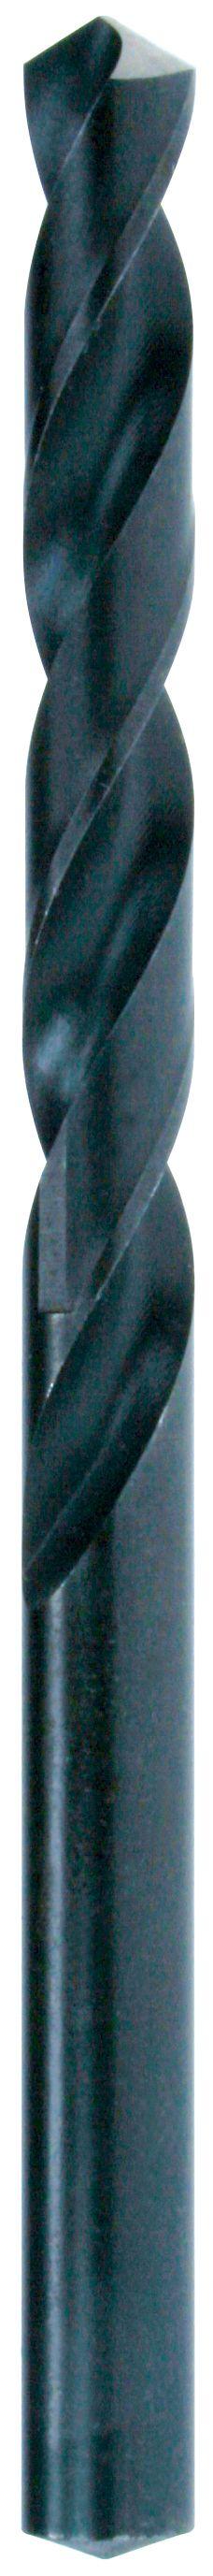 Makita HSS Ground Point Standard Drill Bits